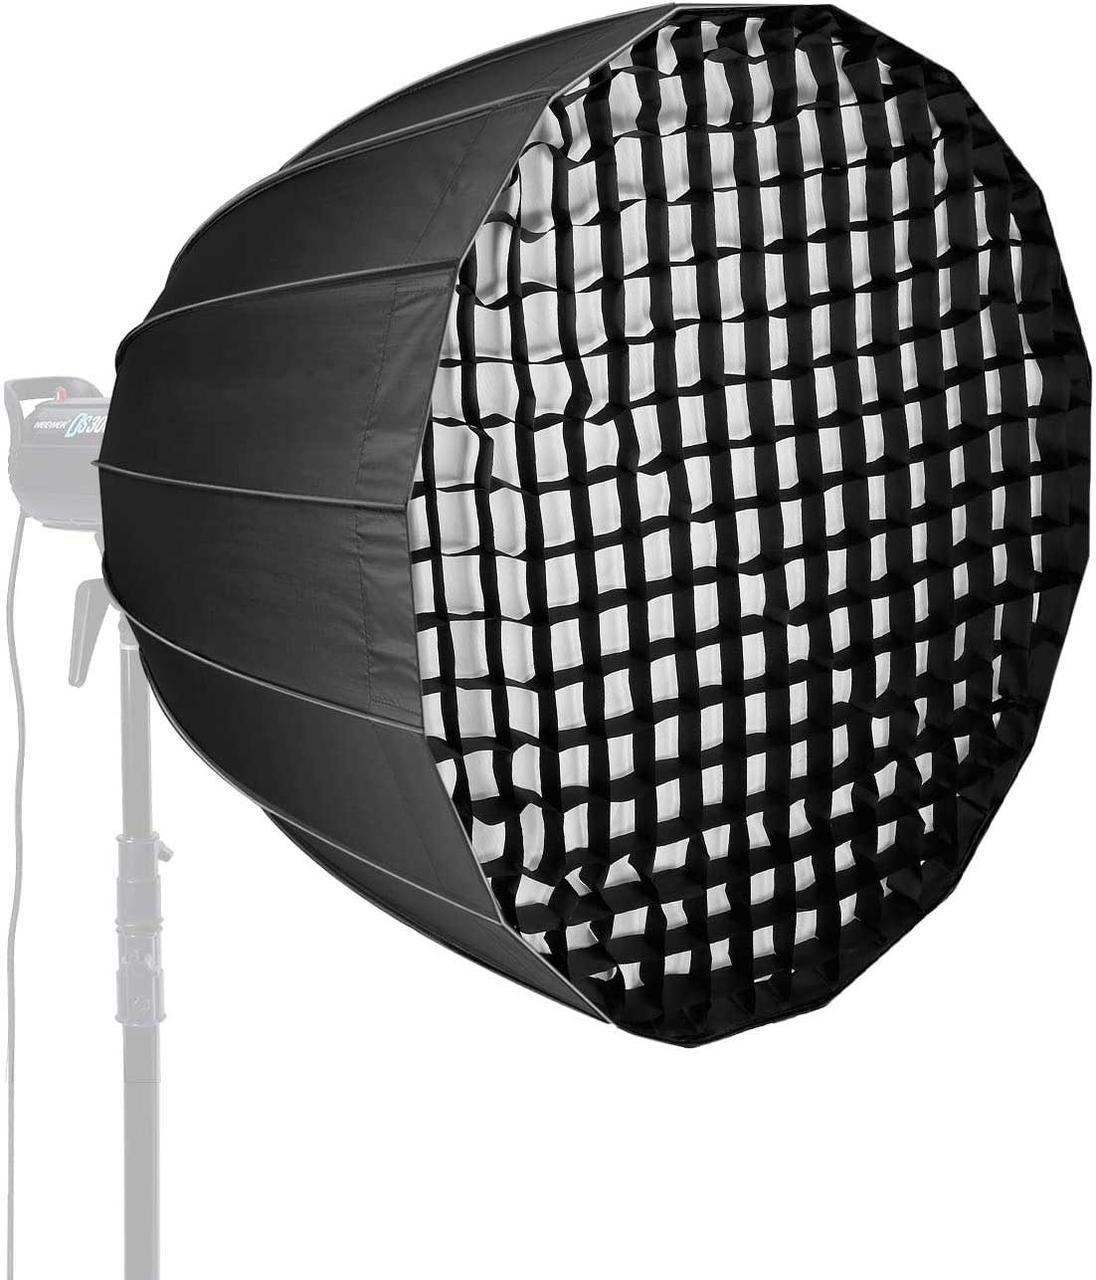 Софтбокс с сотами Visico EB-071G 70см deep quickly umbrella